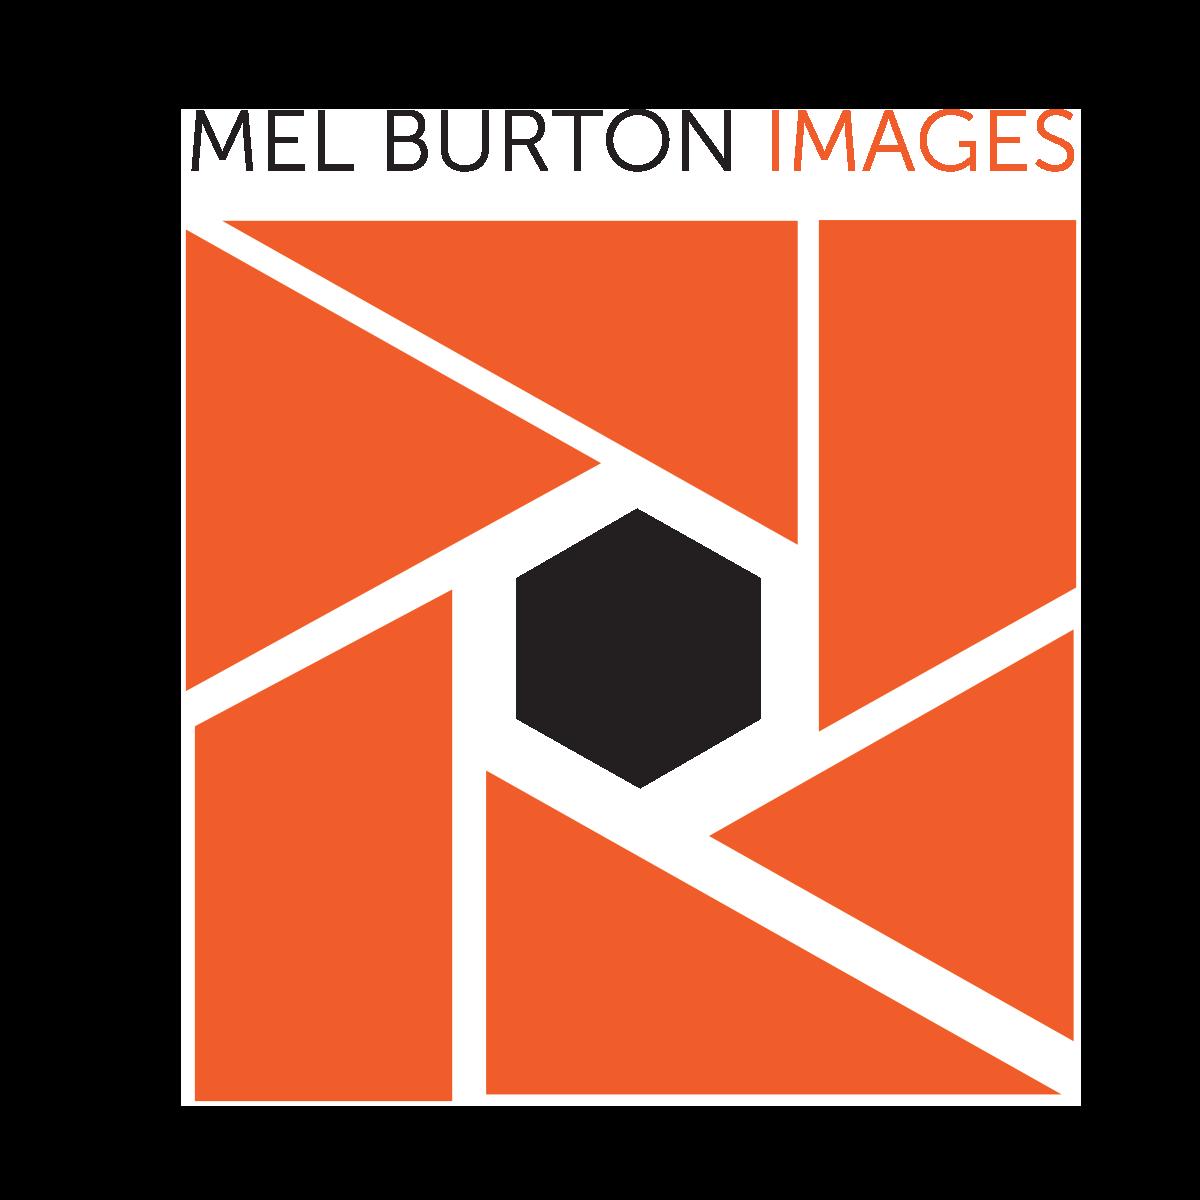 Mel Burton Images